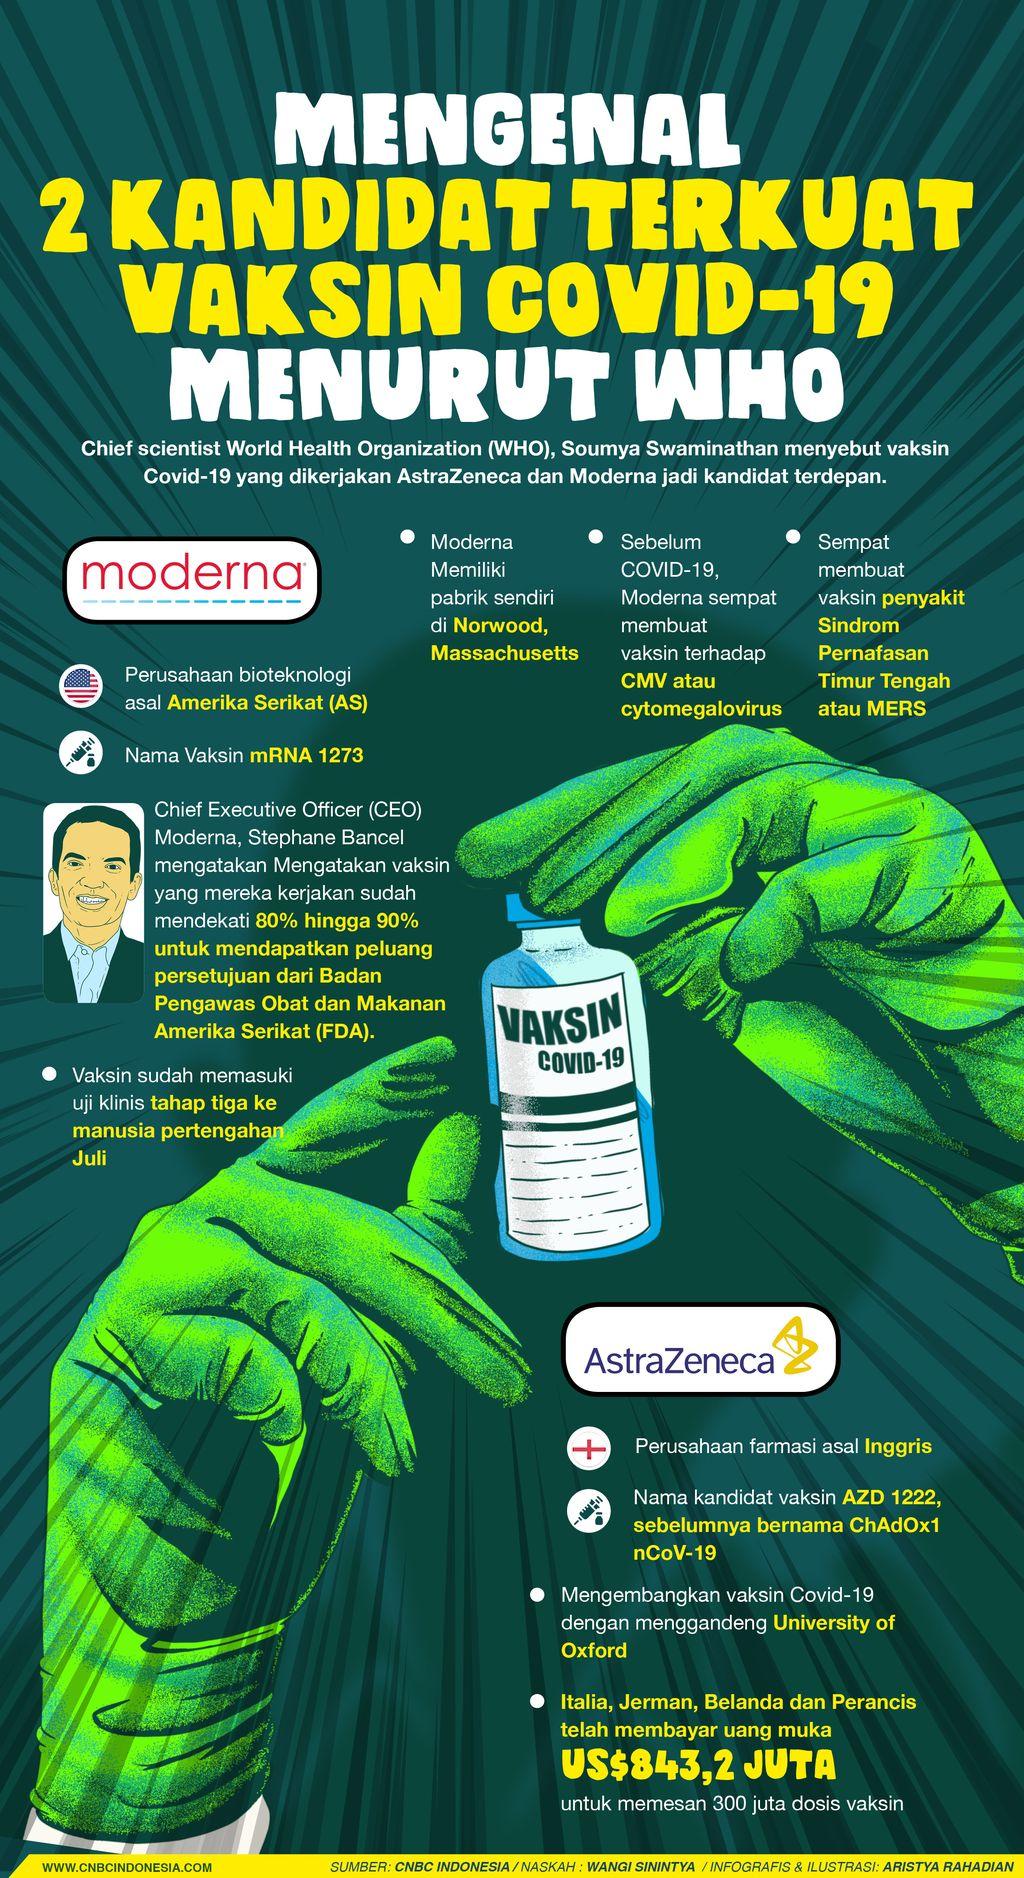 infografismengenal 2 kandidat terkuat vaksin covid 19 menurut whoaristya rahadian 1